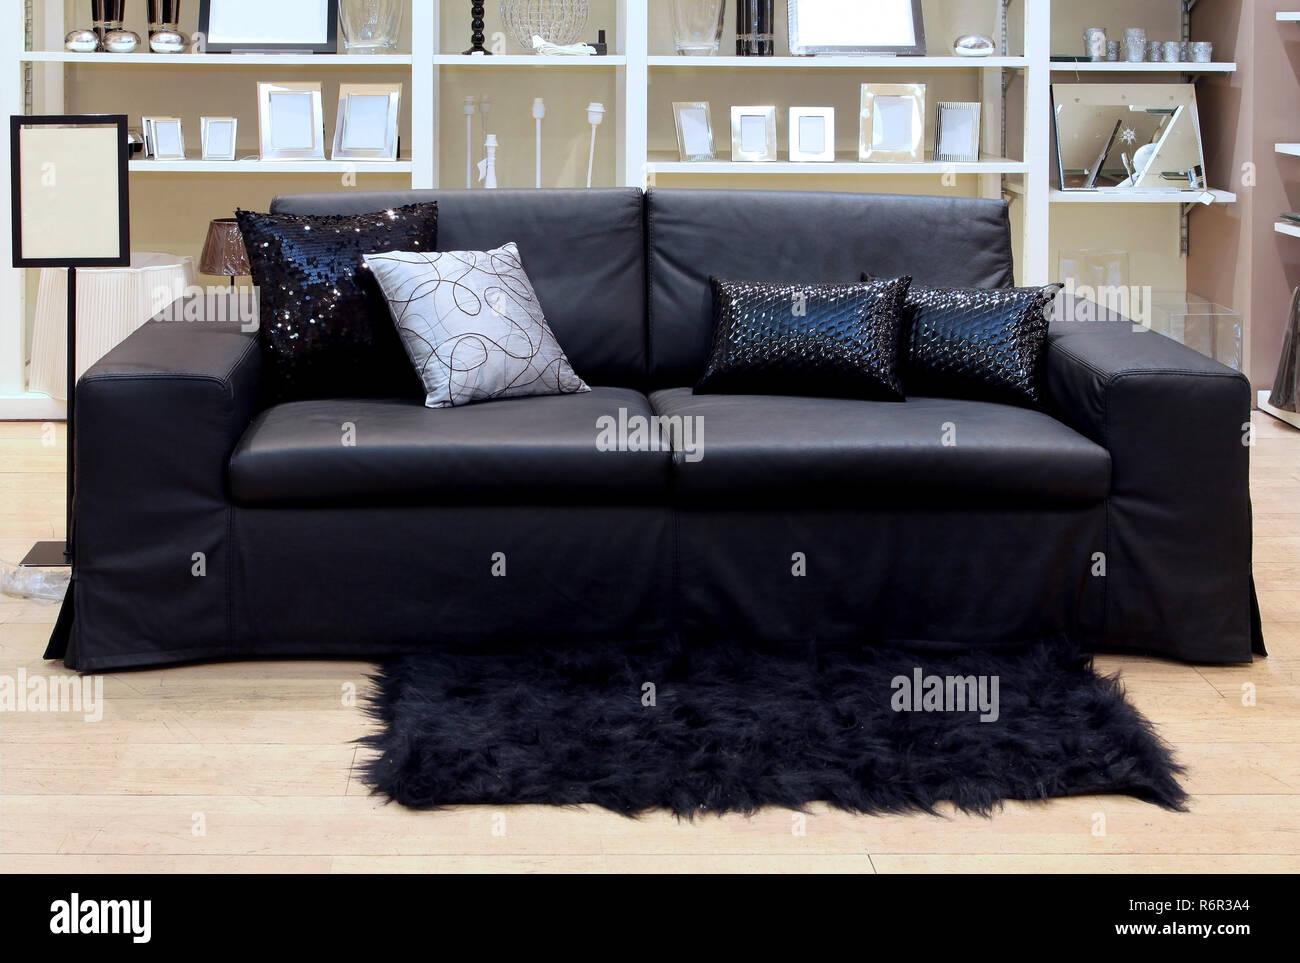 Interior Black Leather Sofa Glass Stockfotos & Interior ...